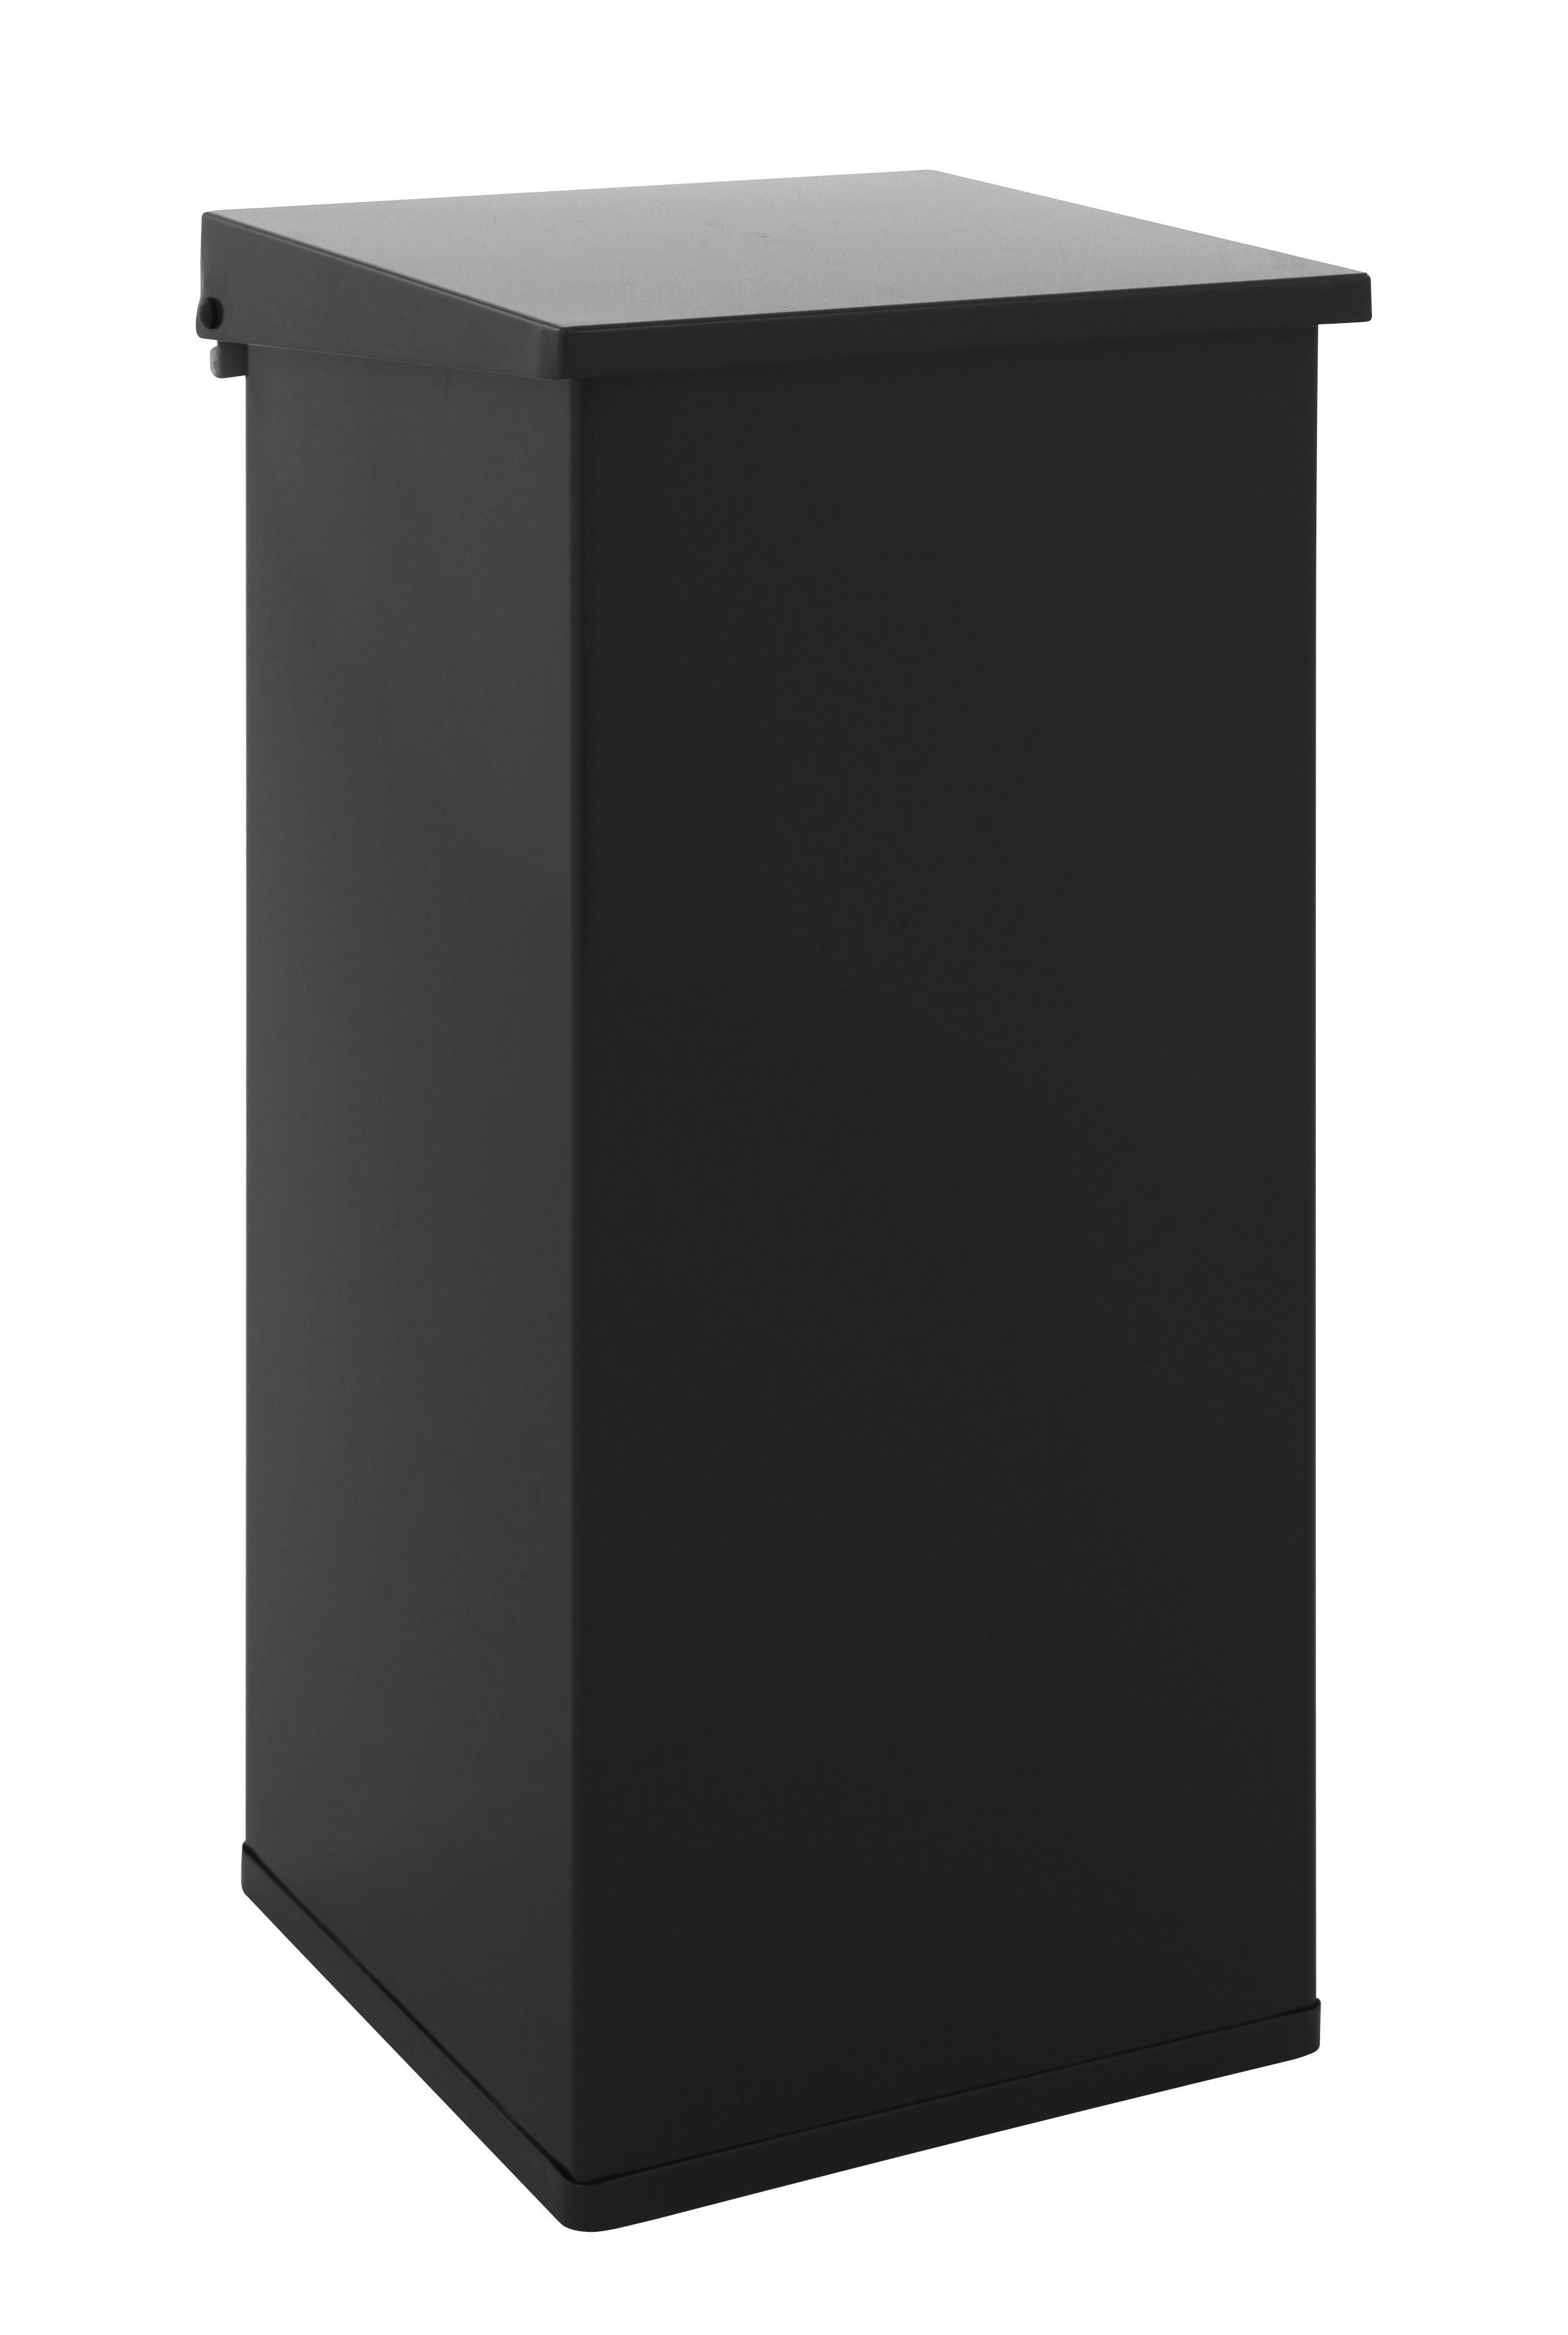 Carro-Lift vuurbestendige afvalbak met demper, 110 liter (VB709809)